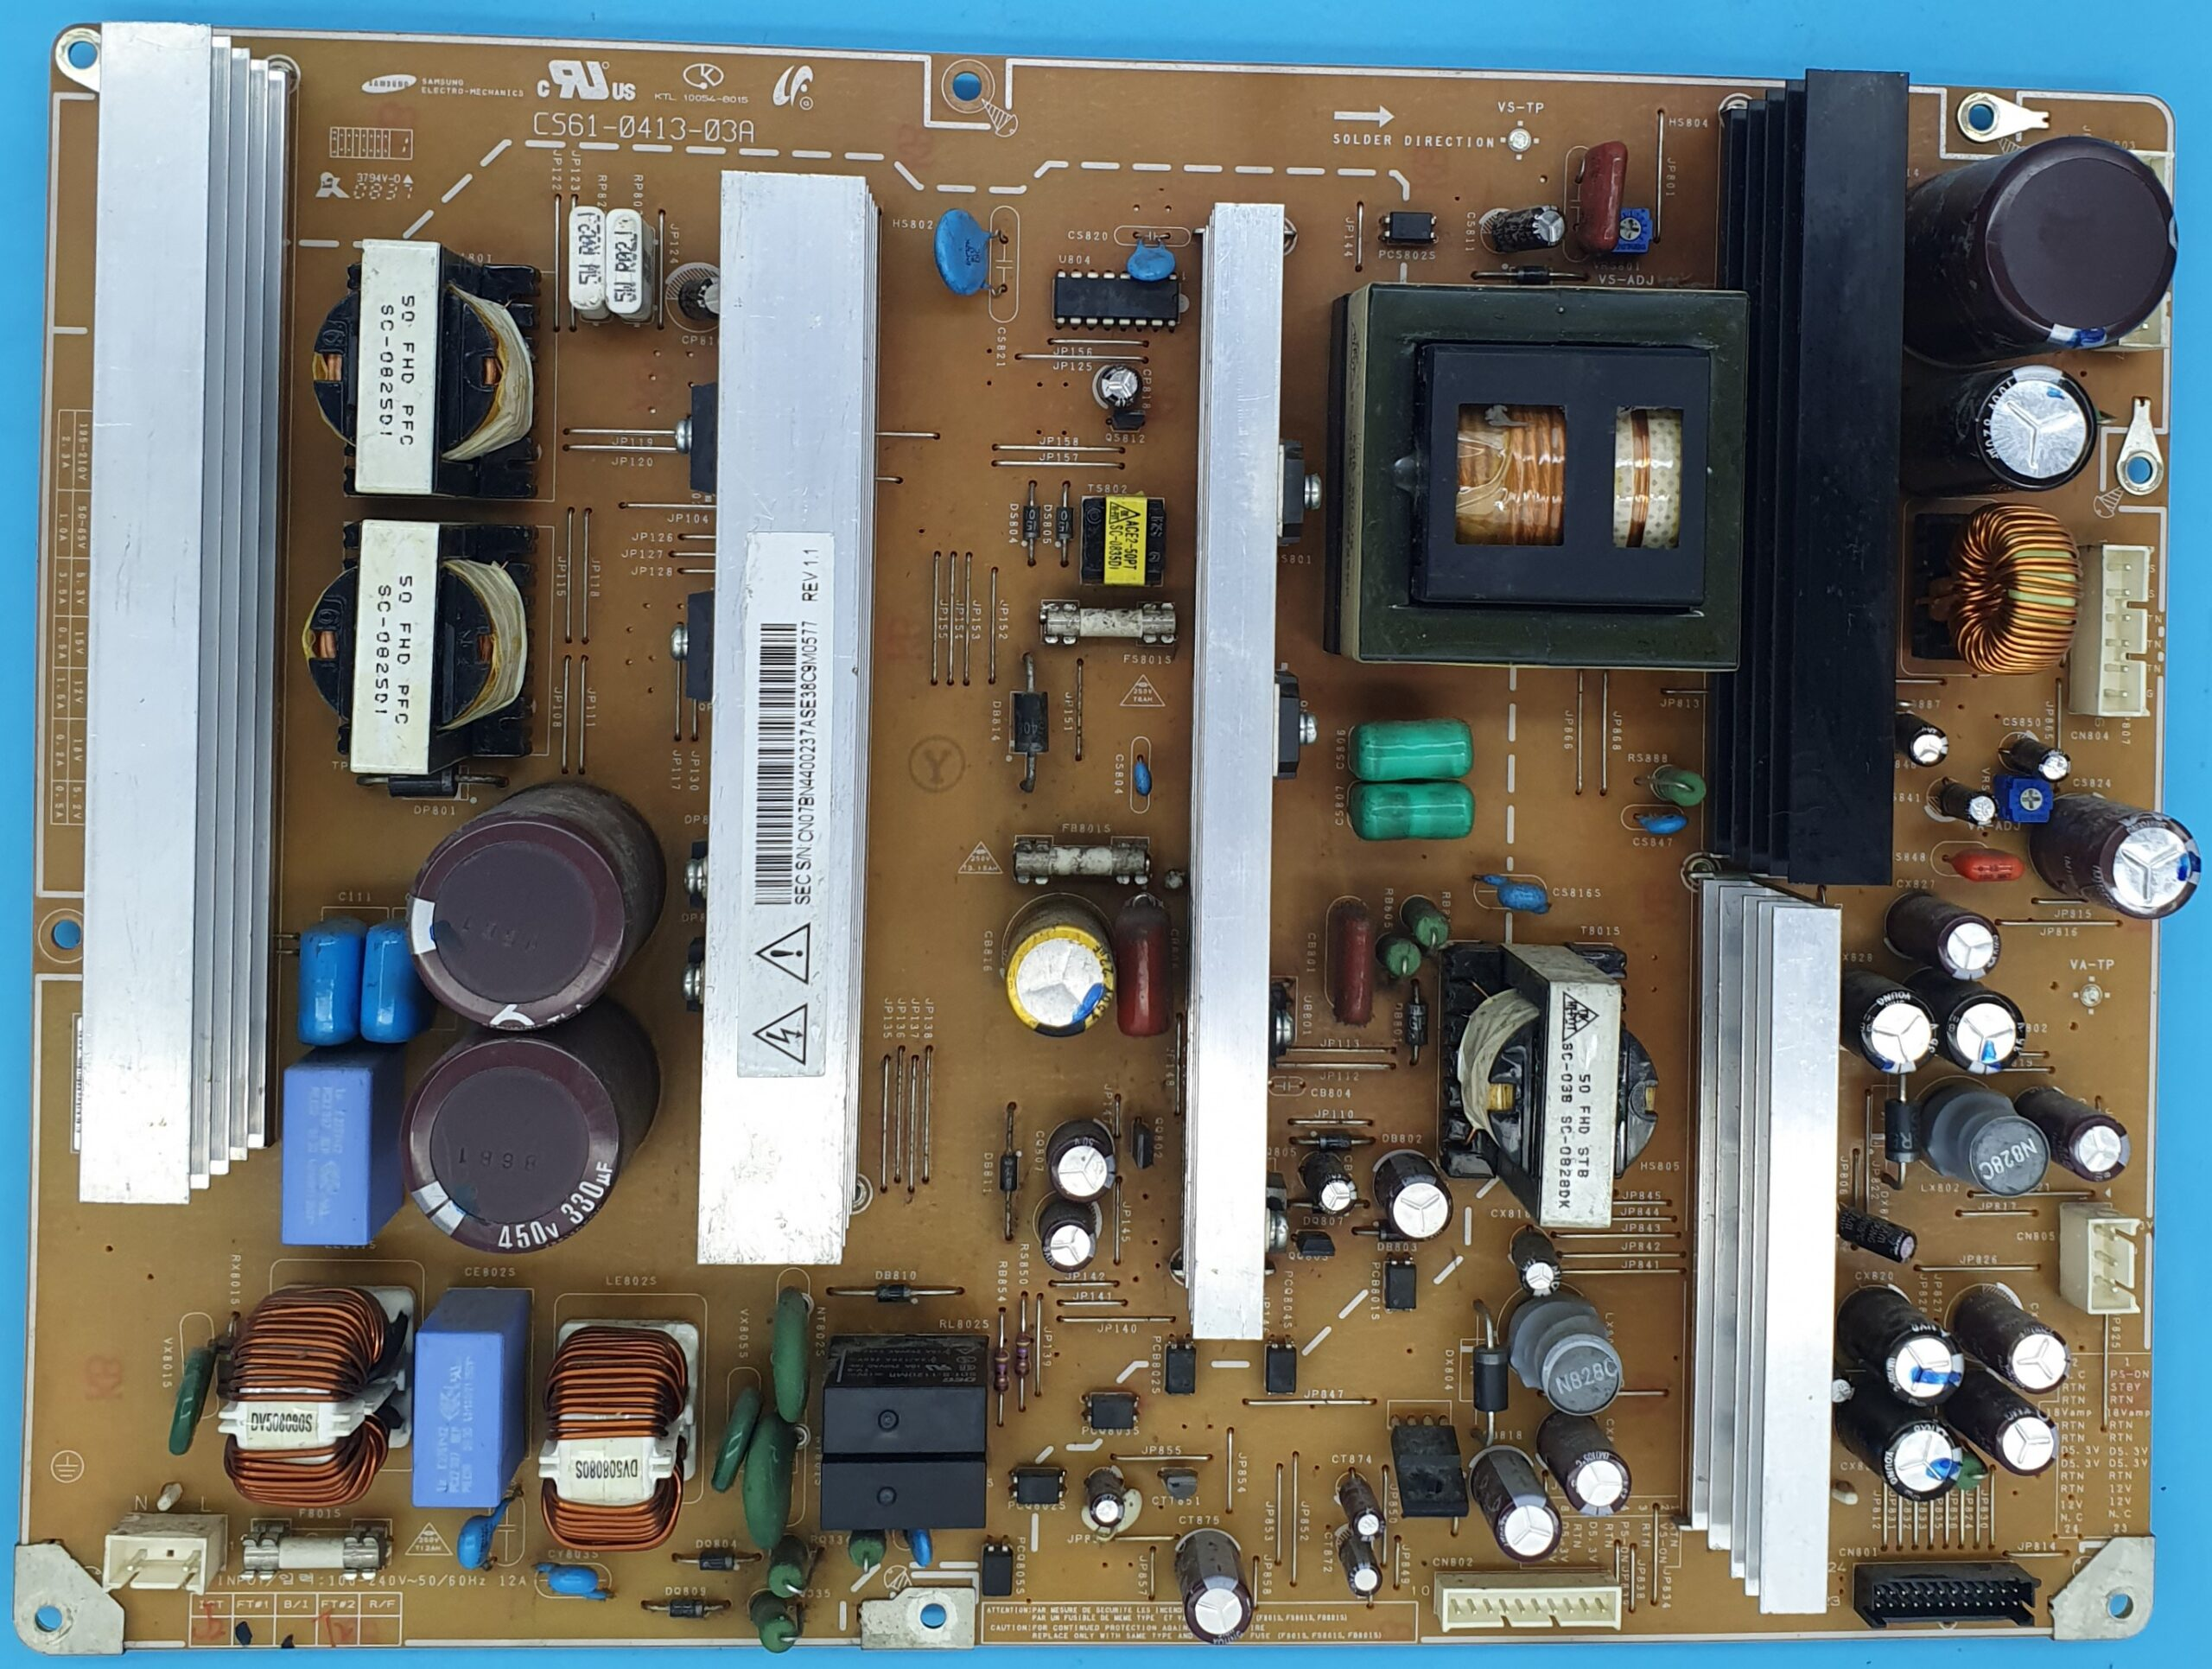 BN44-00237A Samsung Power (KDV DAHİL = 150 TL)